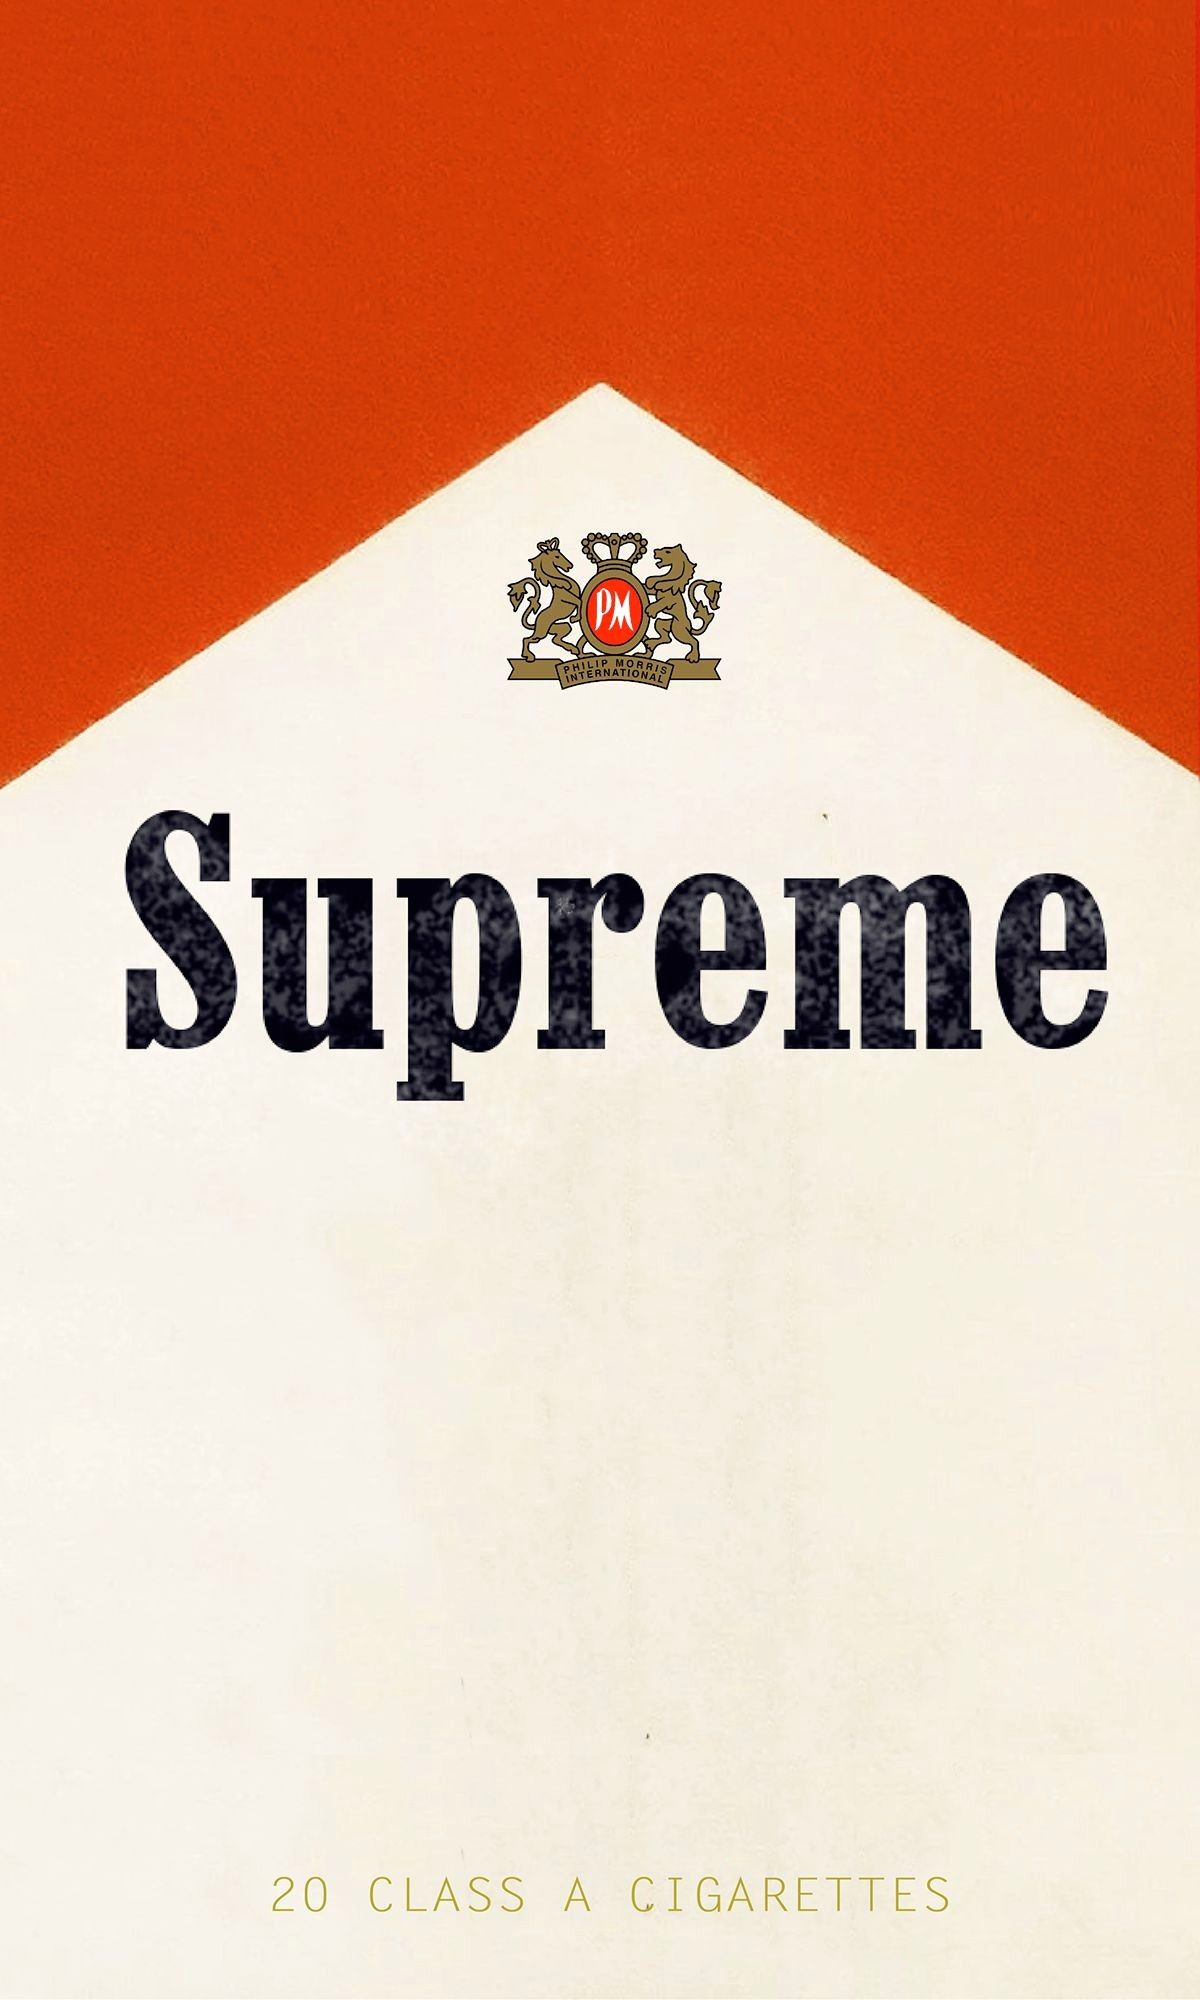 719x1280 Supreme Iphone Wallpaper